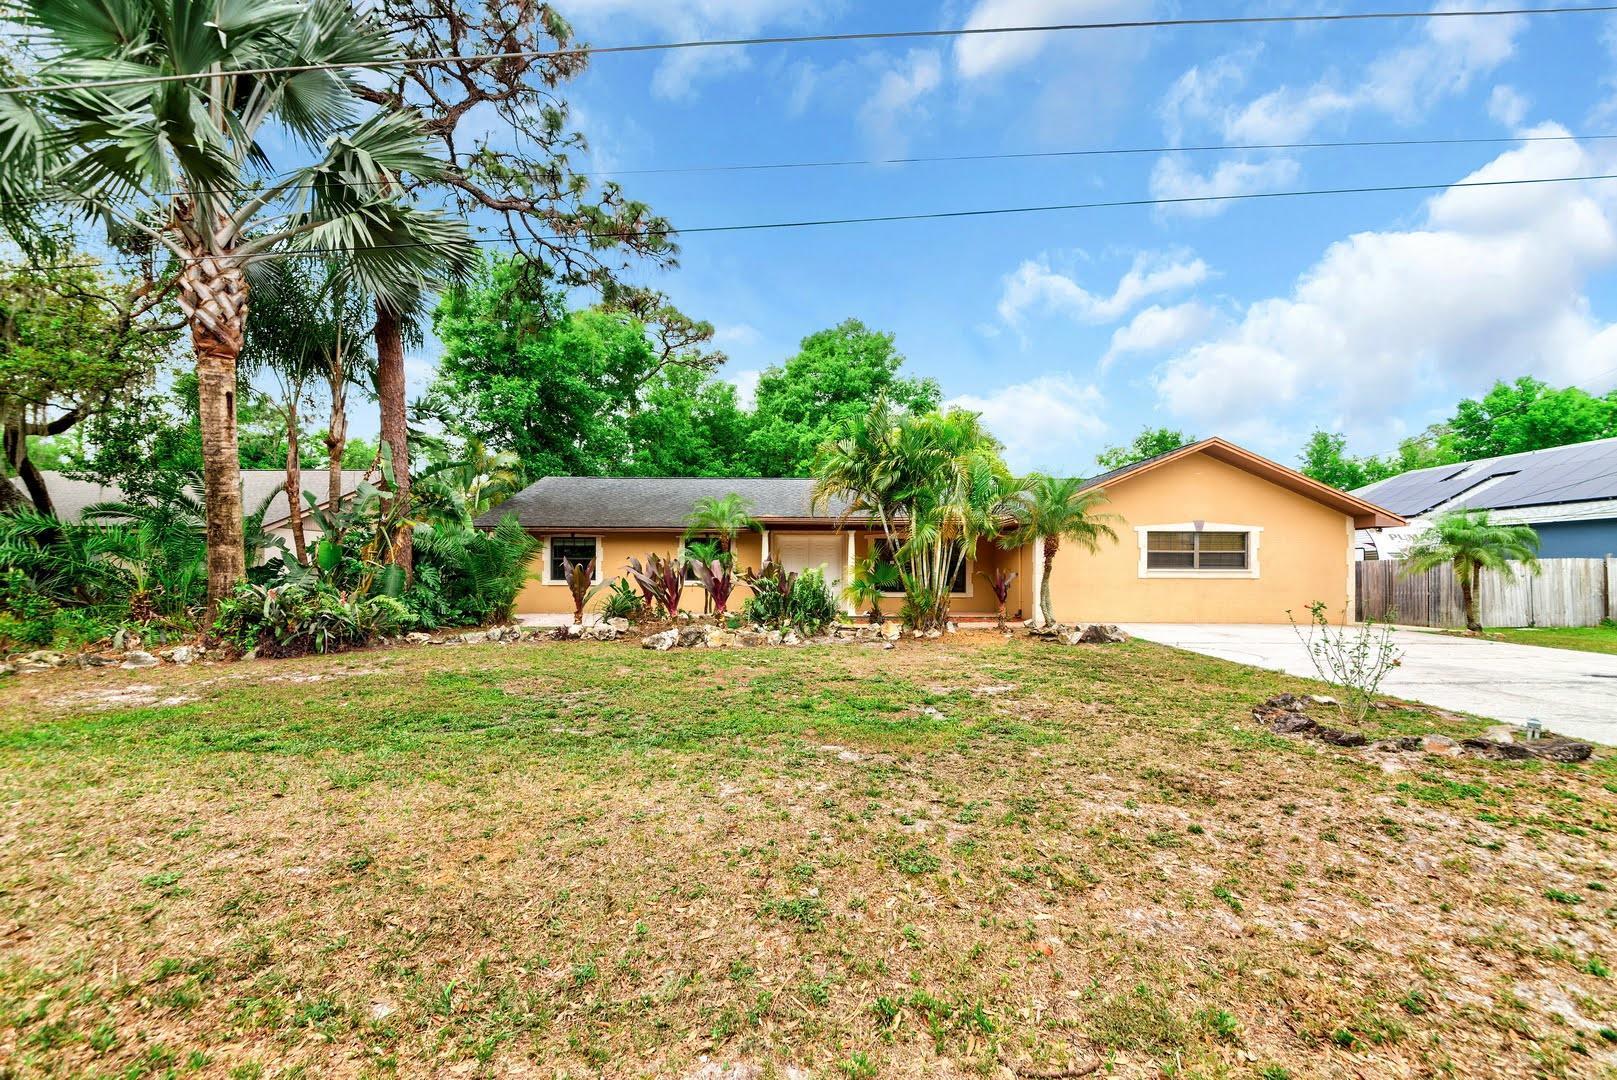 9440 W Paulinda Avenue, APOPKA, Florida 32703, 4 Bedrooms Bedrooms, ,3 BathroomsBathrooms,Single Family,For Sale,9440 W Paulinda Avenue,1,897554